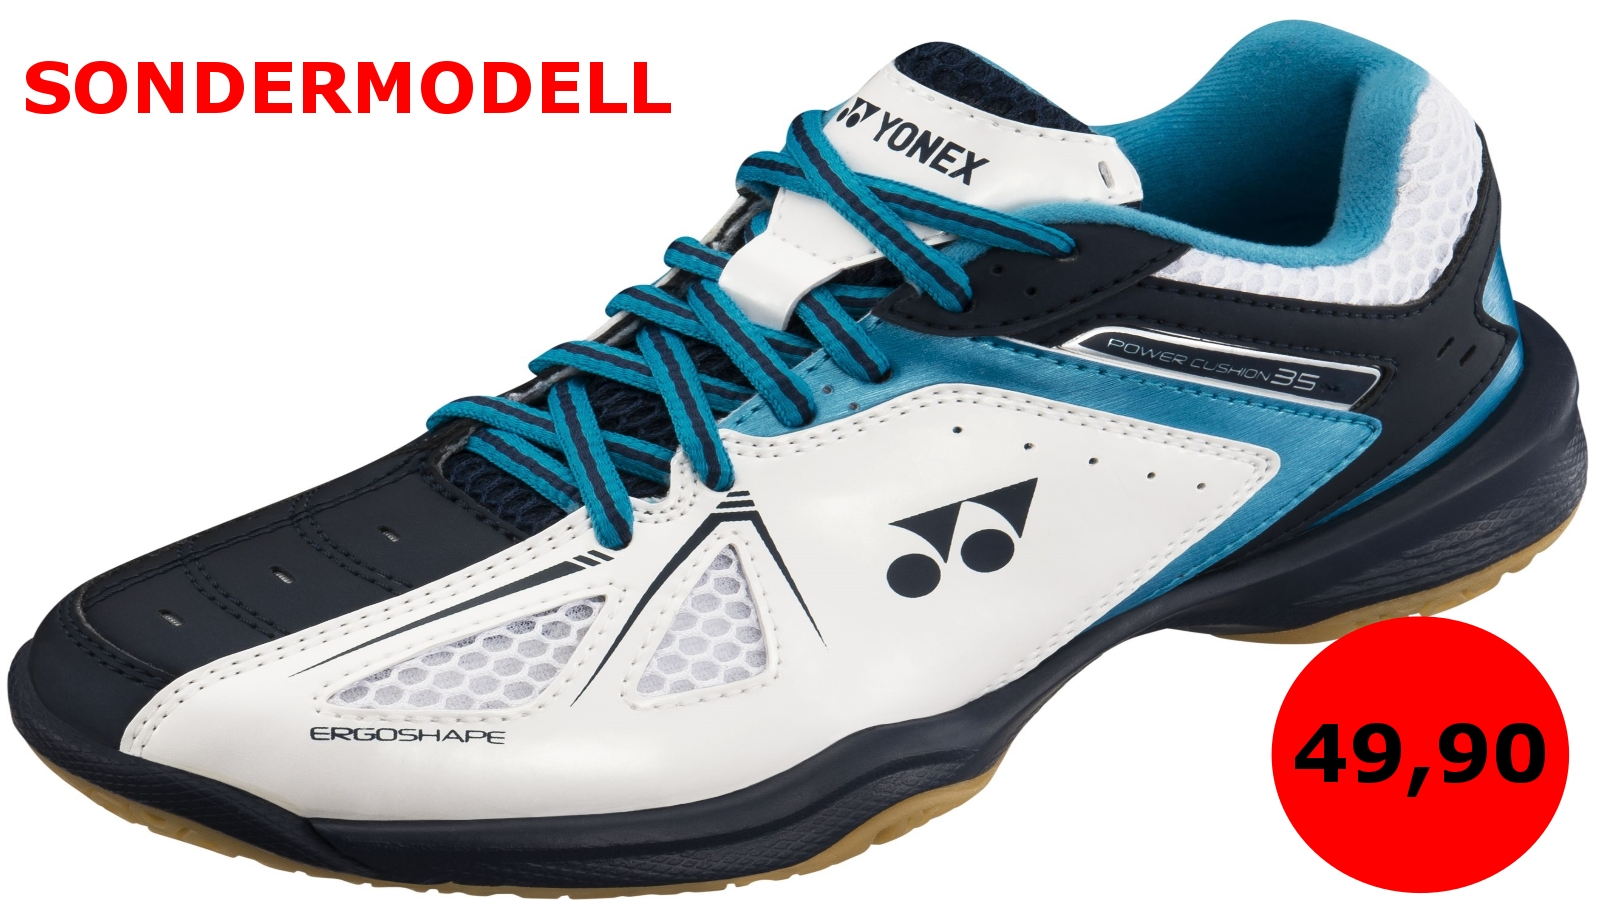 Yonex PC 35 Sondermodell